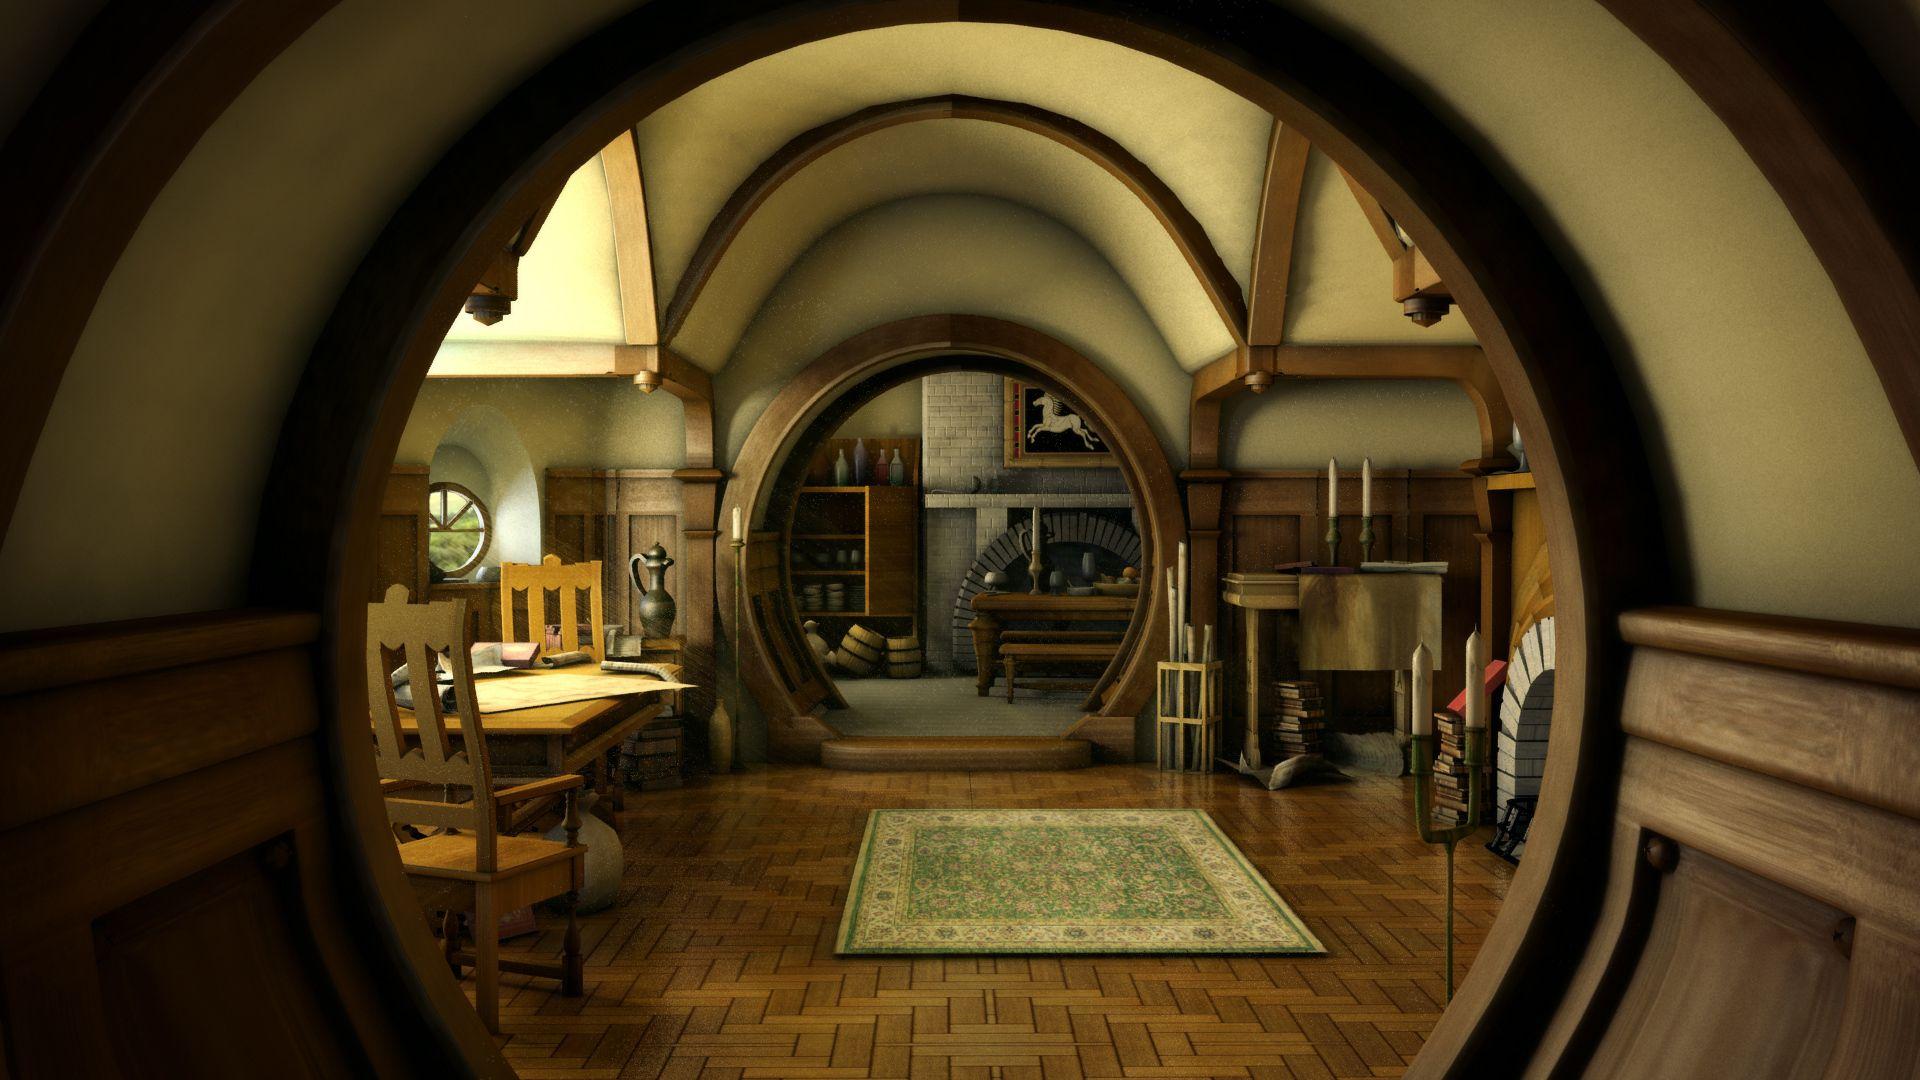 Lord Of The Rings Hobbit Home 5574 Elegant Hobbit Home Designs